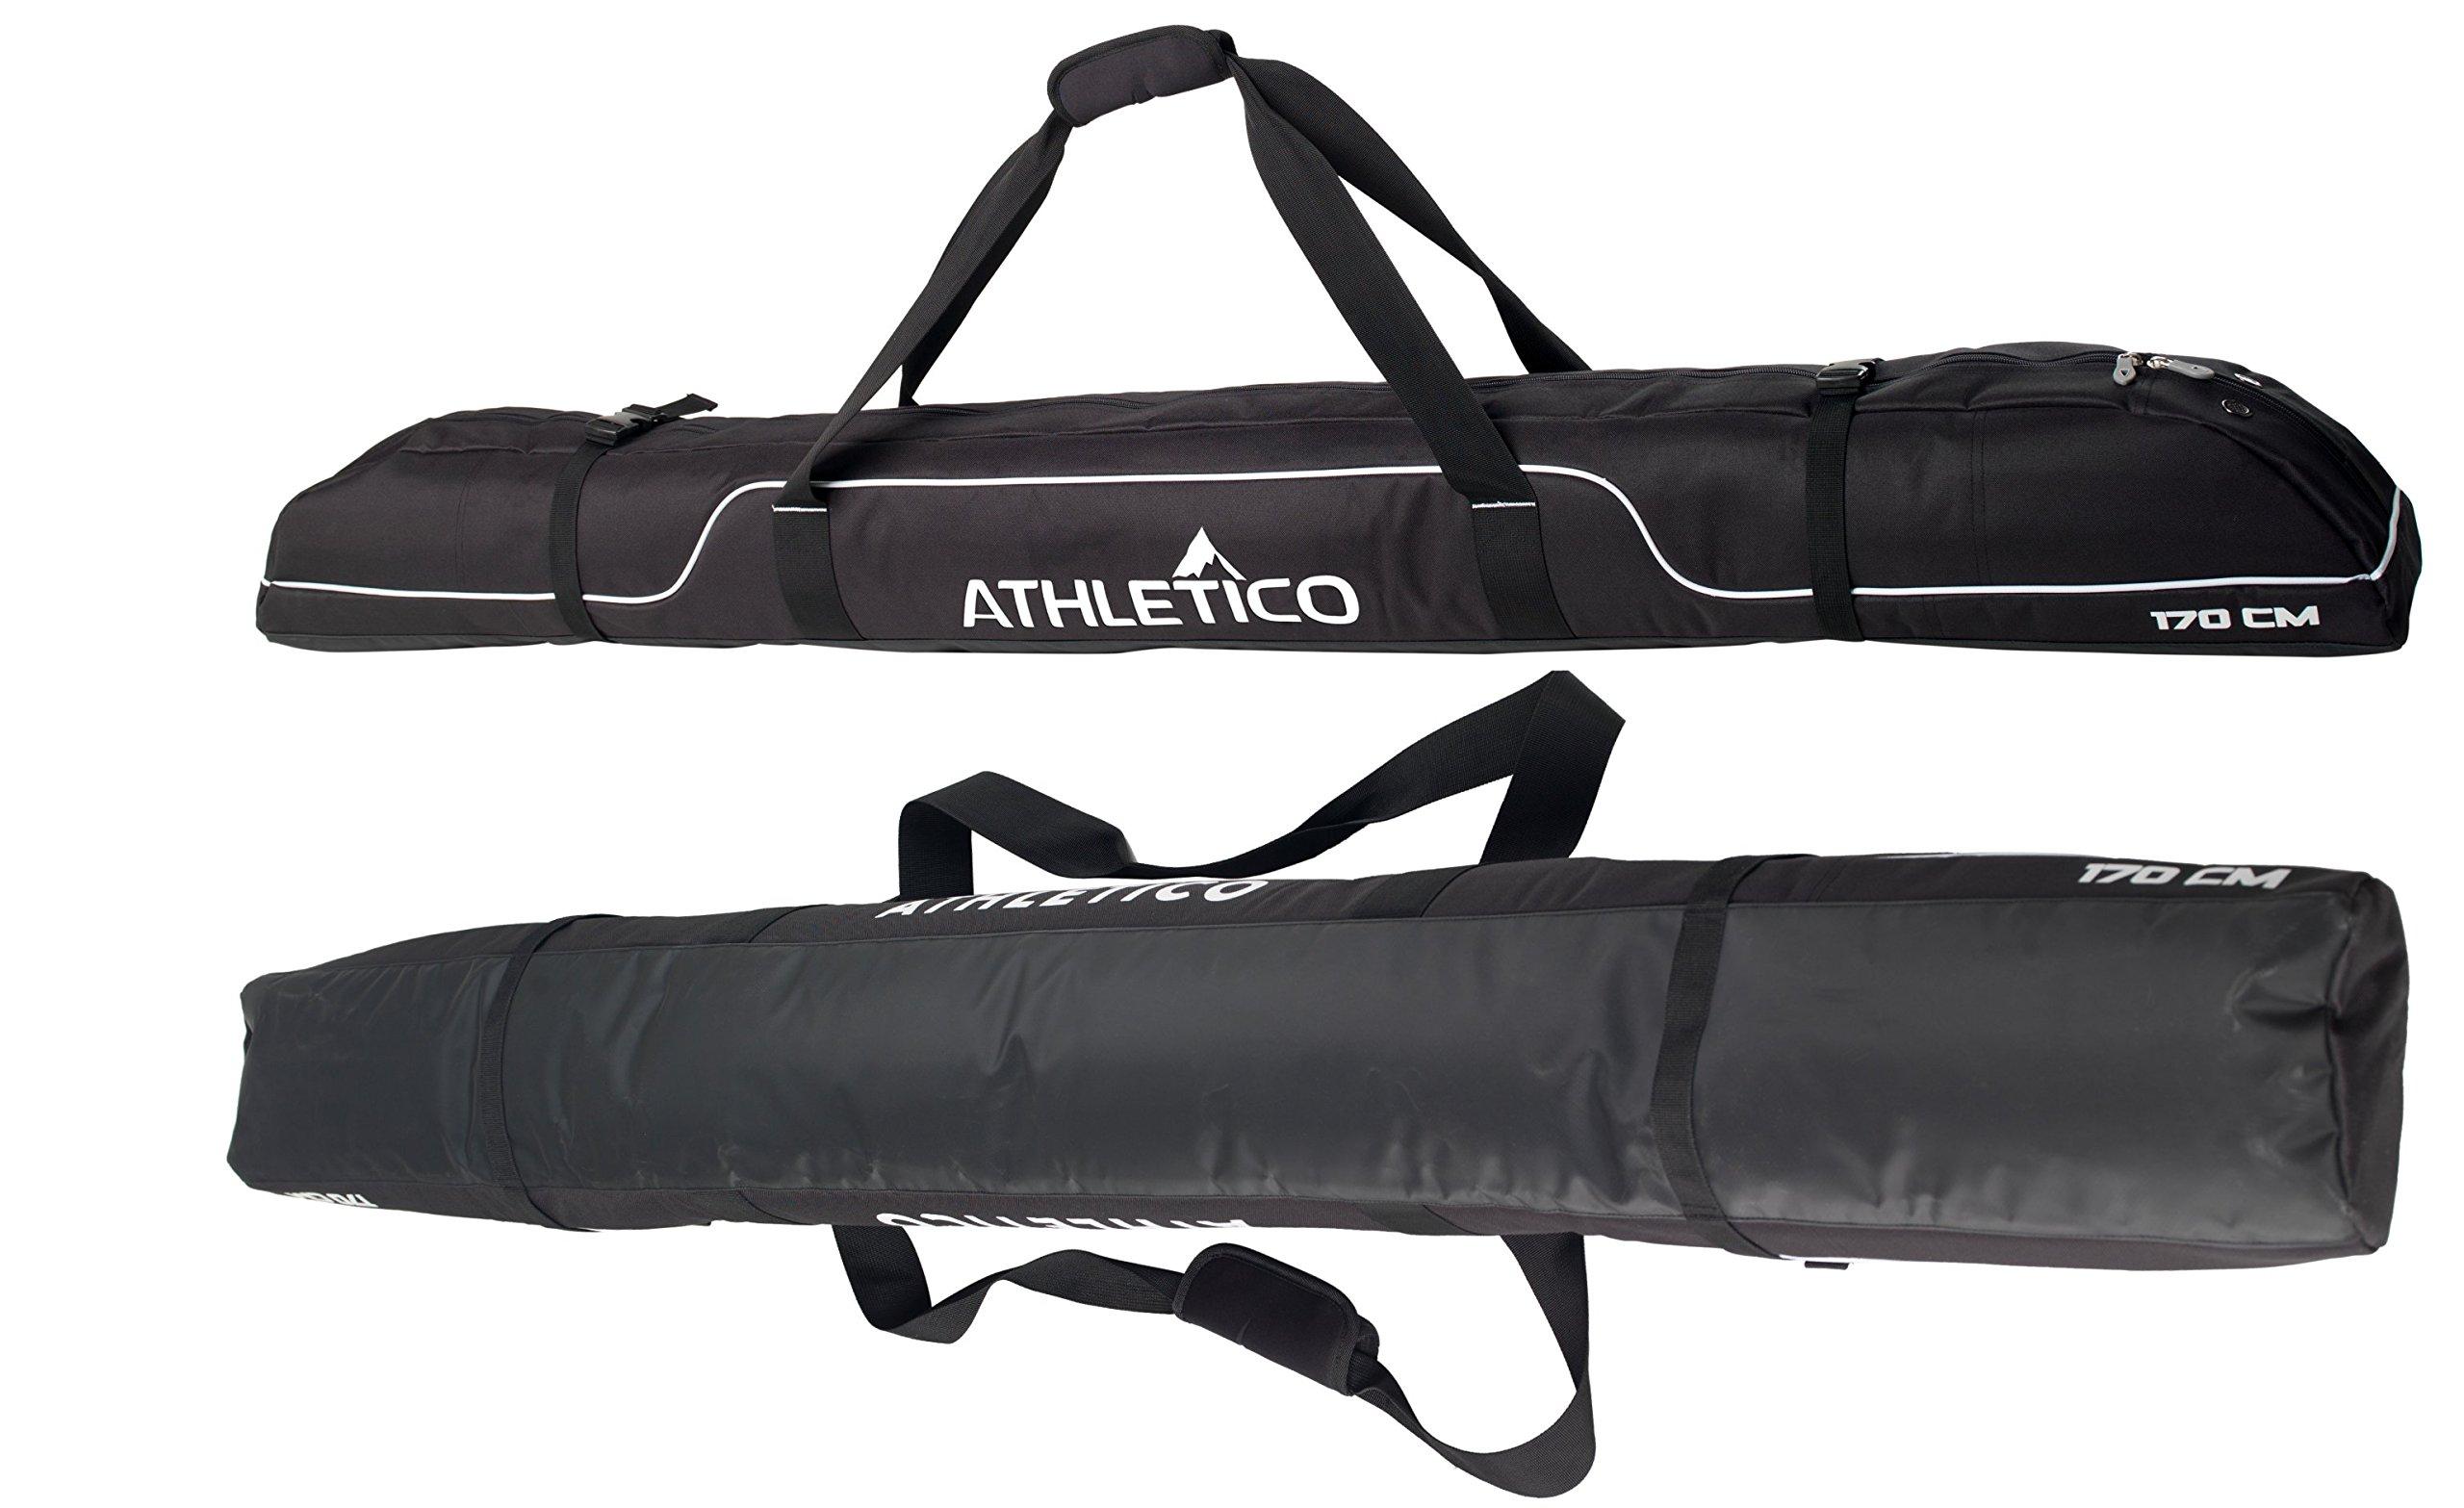 Athletico Diamond Trail Padded Ski Bag Single Ski Travel Bag to Transport Skis